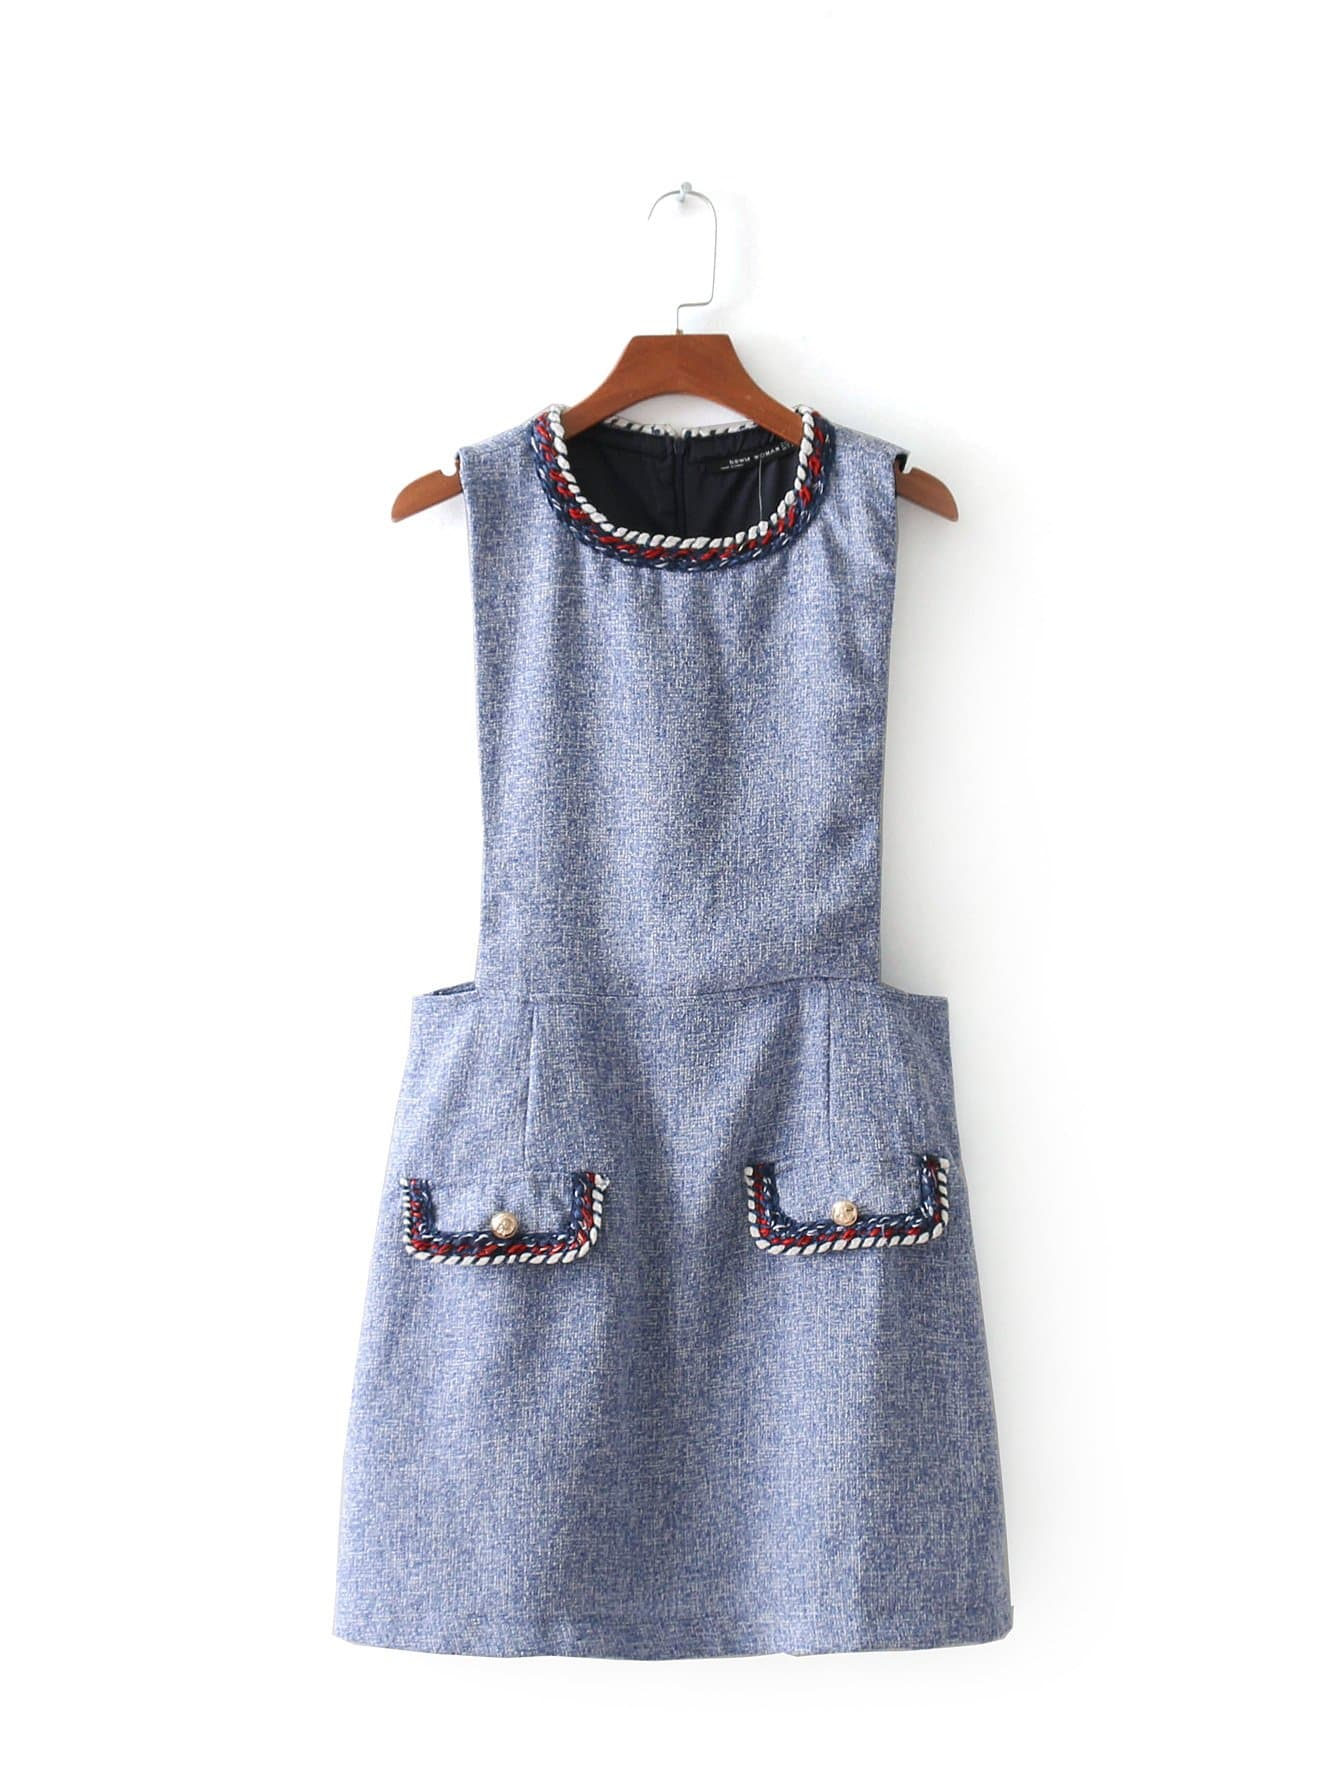 Contrast Trim Tweed Dress contrast tie neck faux pocket tweed dress